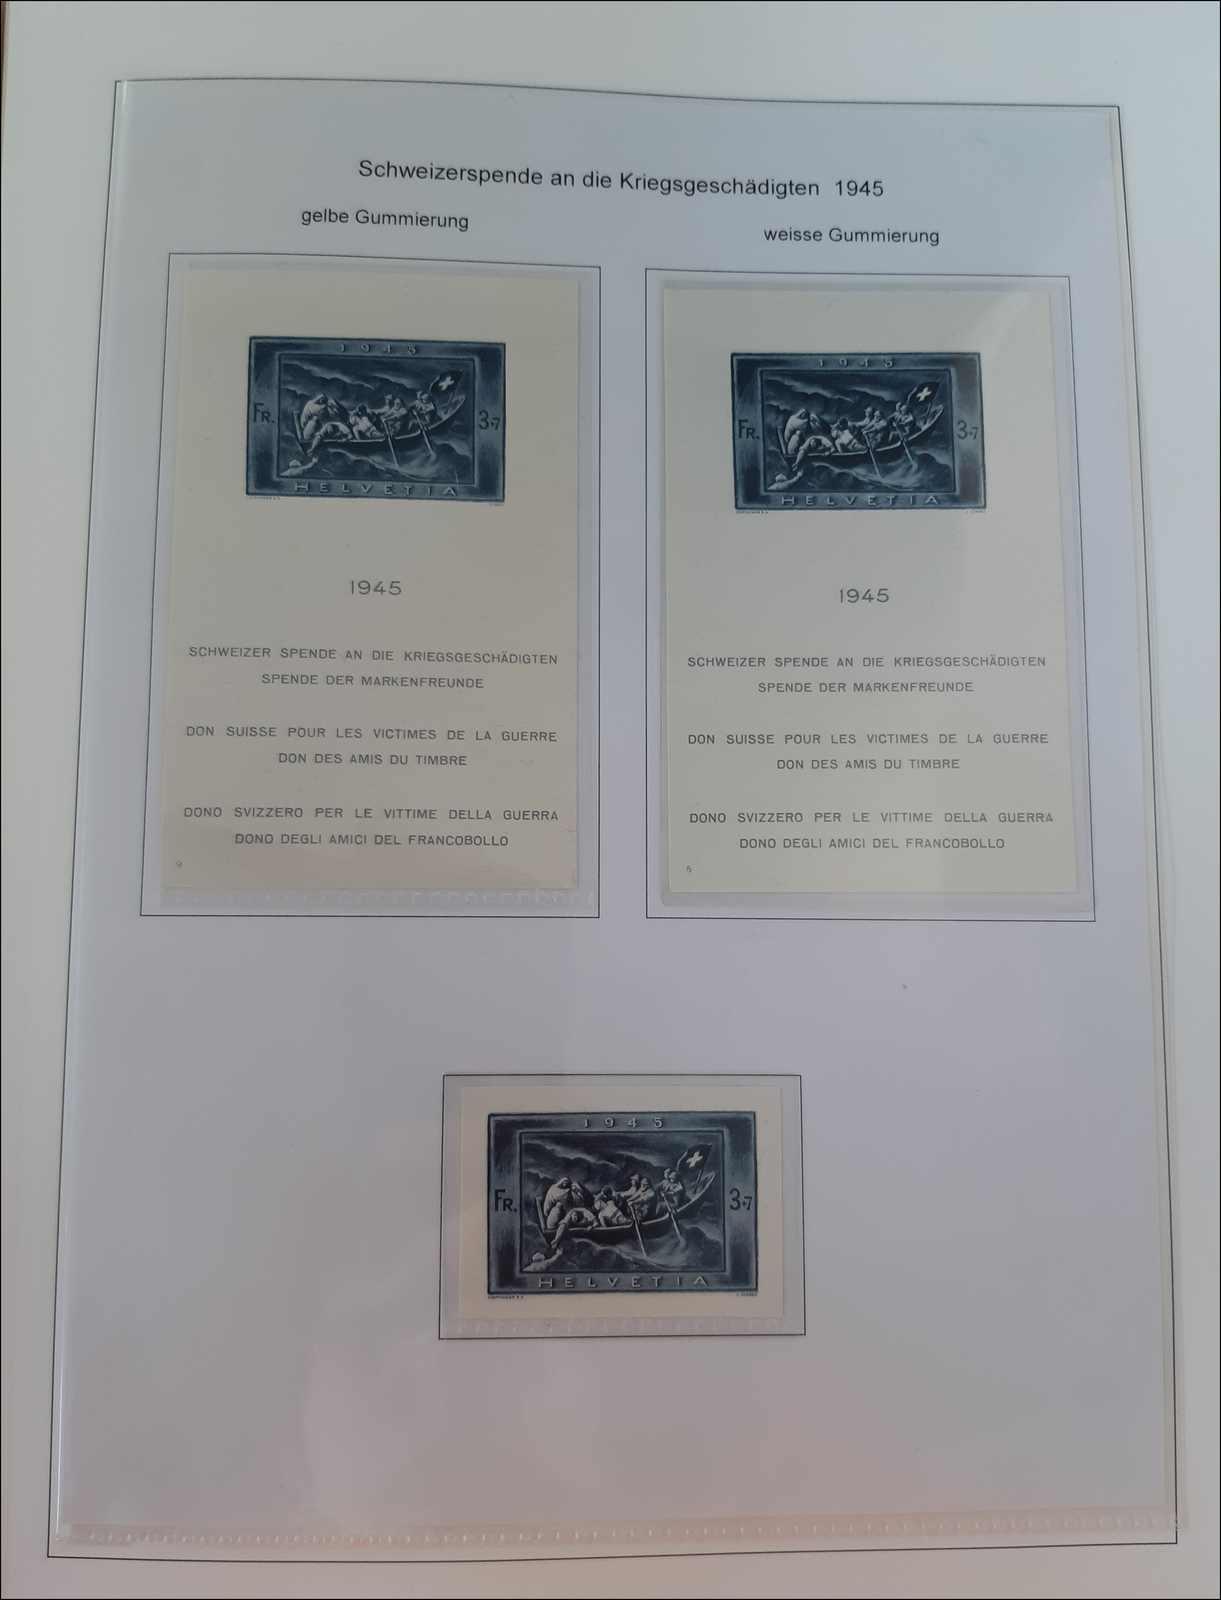 Lot 212 - schweiz Schweiz Blöcke -  Rolli Auctions Auction #68 Day 1